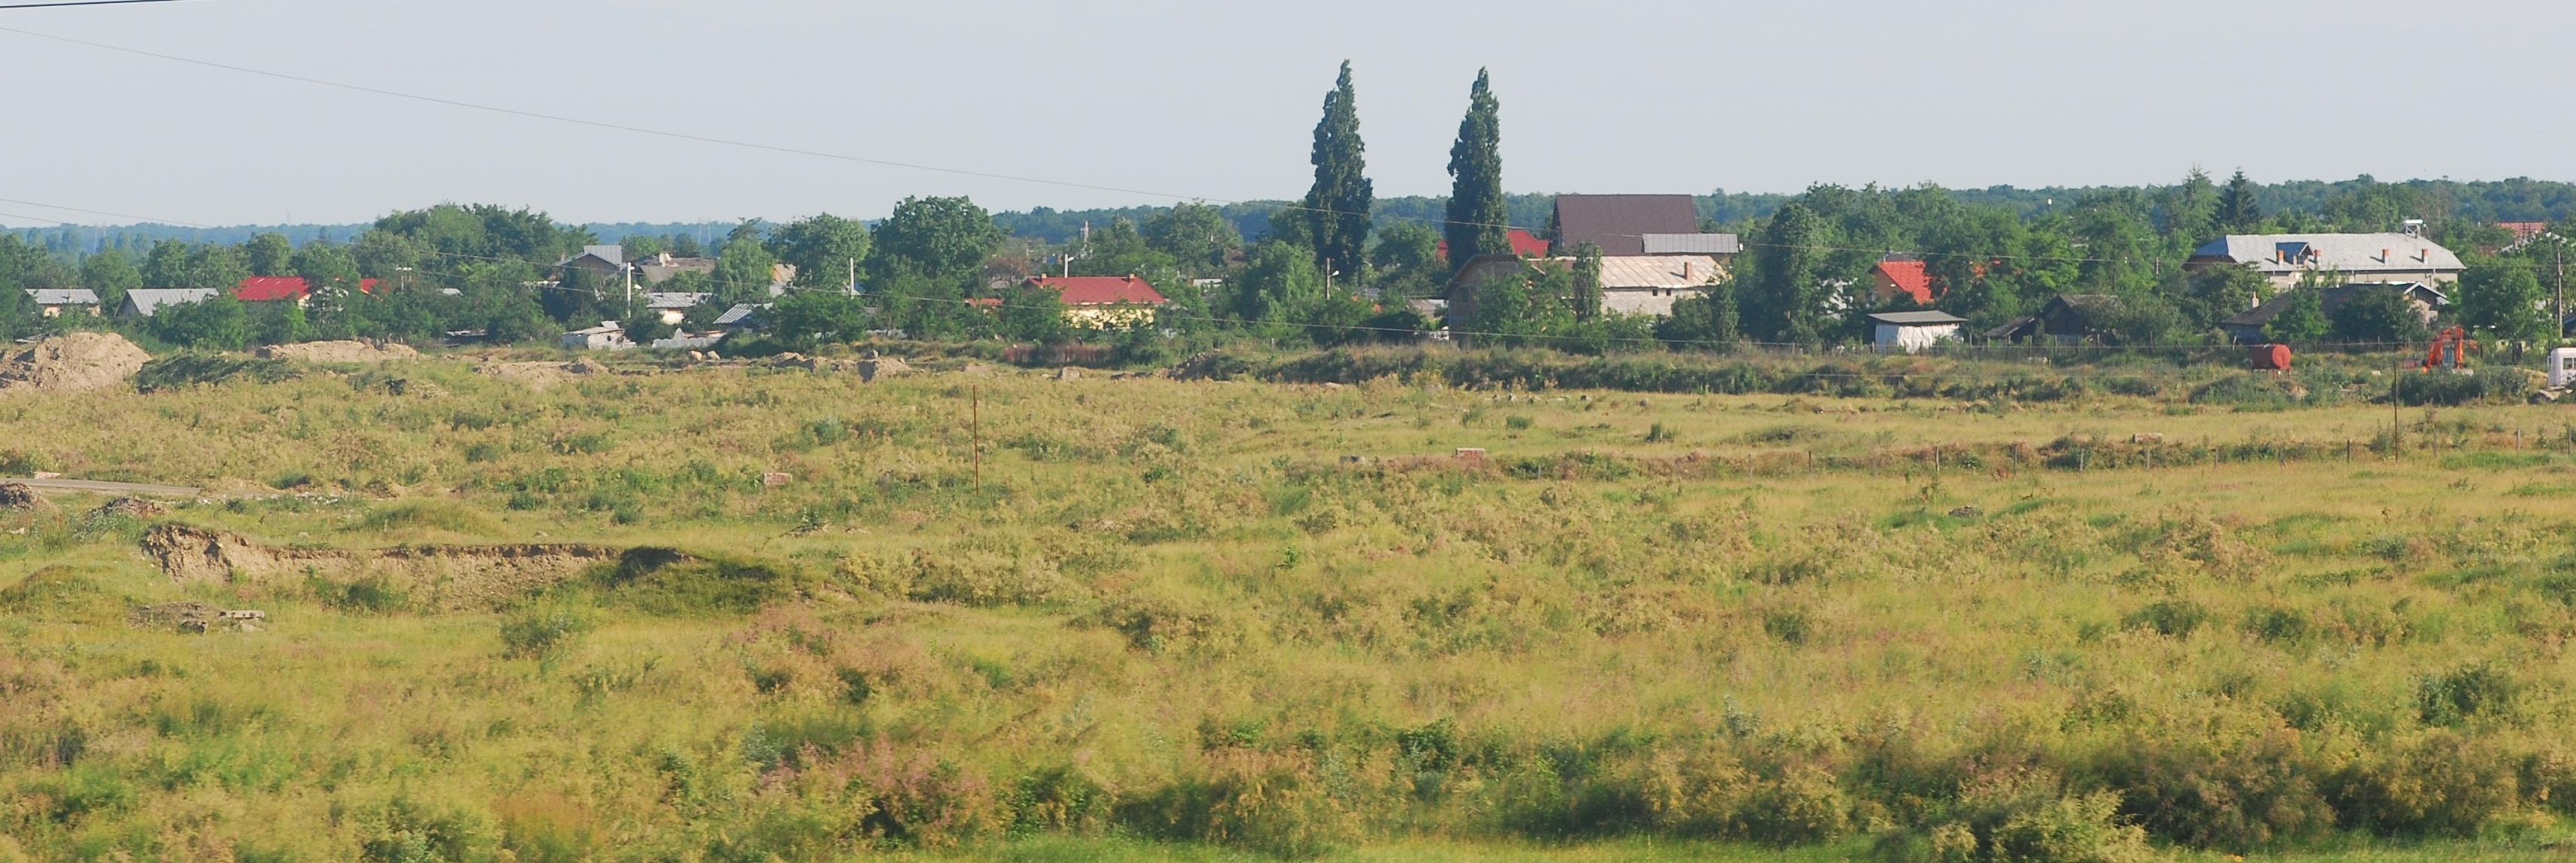 Comuna Berceni Prahova Wikipedia